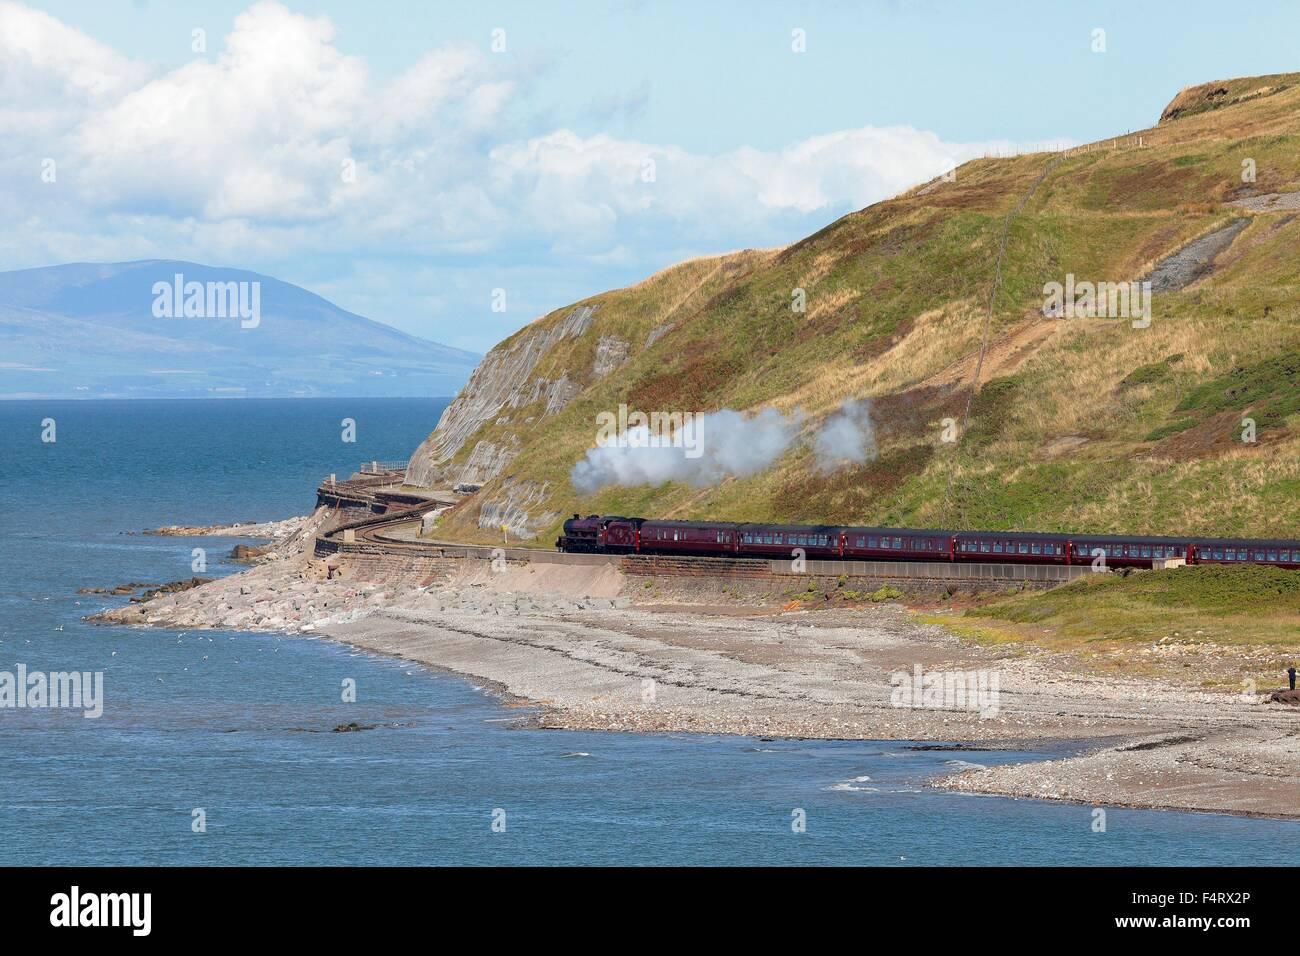 Steam locomotive LMS Jubilee Class 45699 Galatea. Parton Bay, Parton, Whitehaven, Cumbria, England, UK. Stock Photo